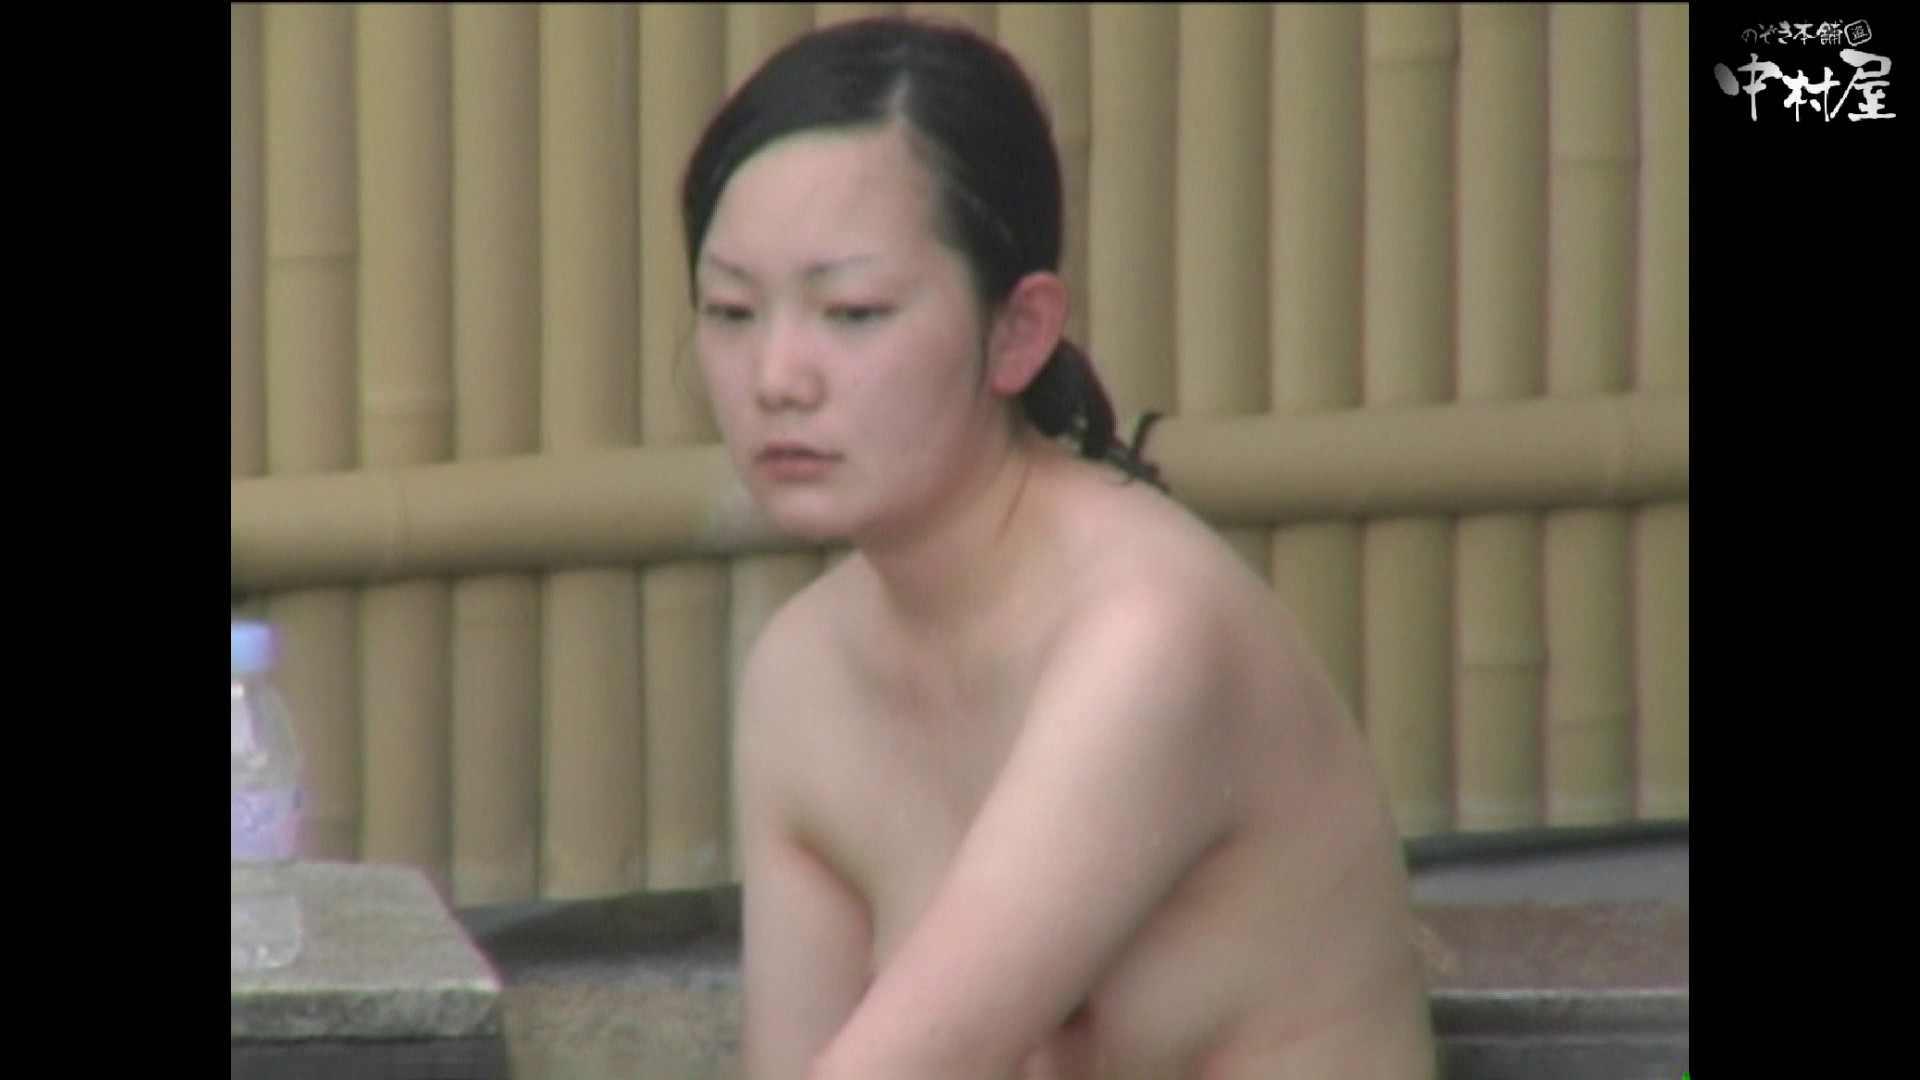 Aquaな露天風呂Vol.892 露天風呂   OLのエロ生活  39連発 28